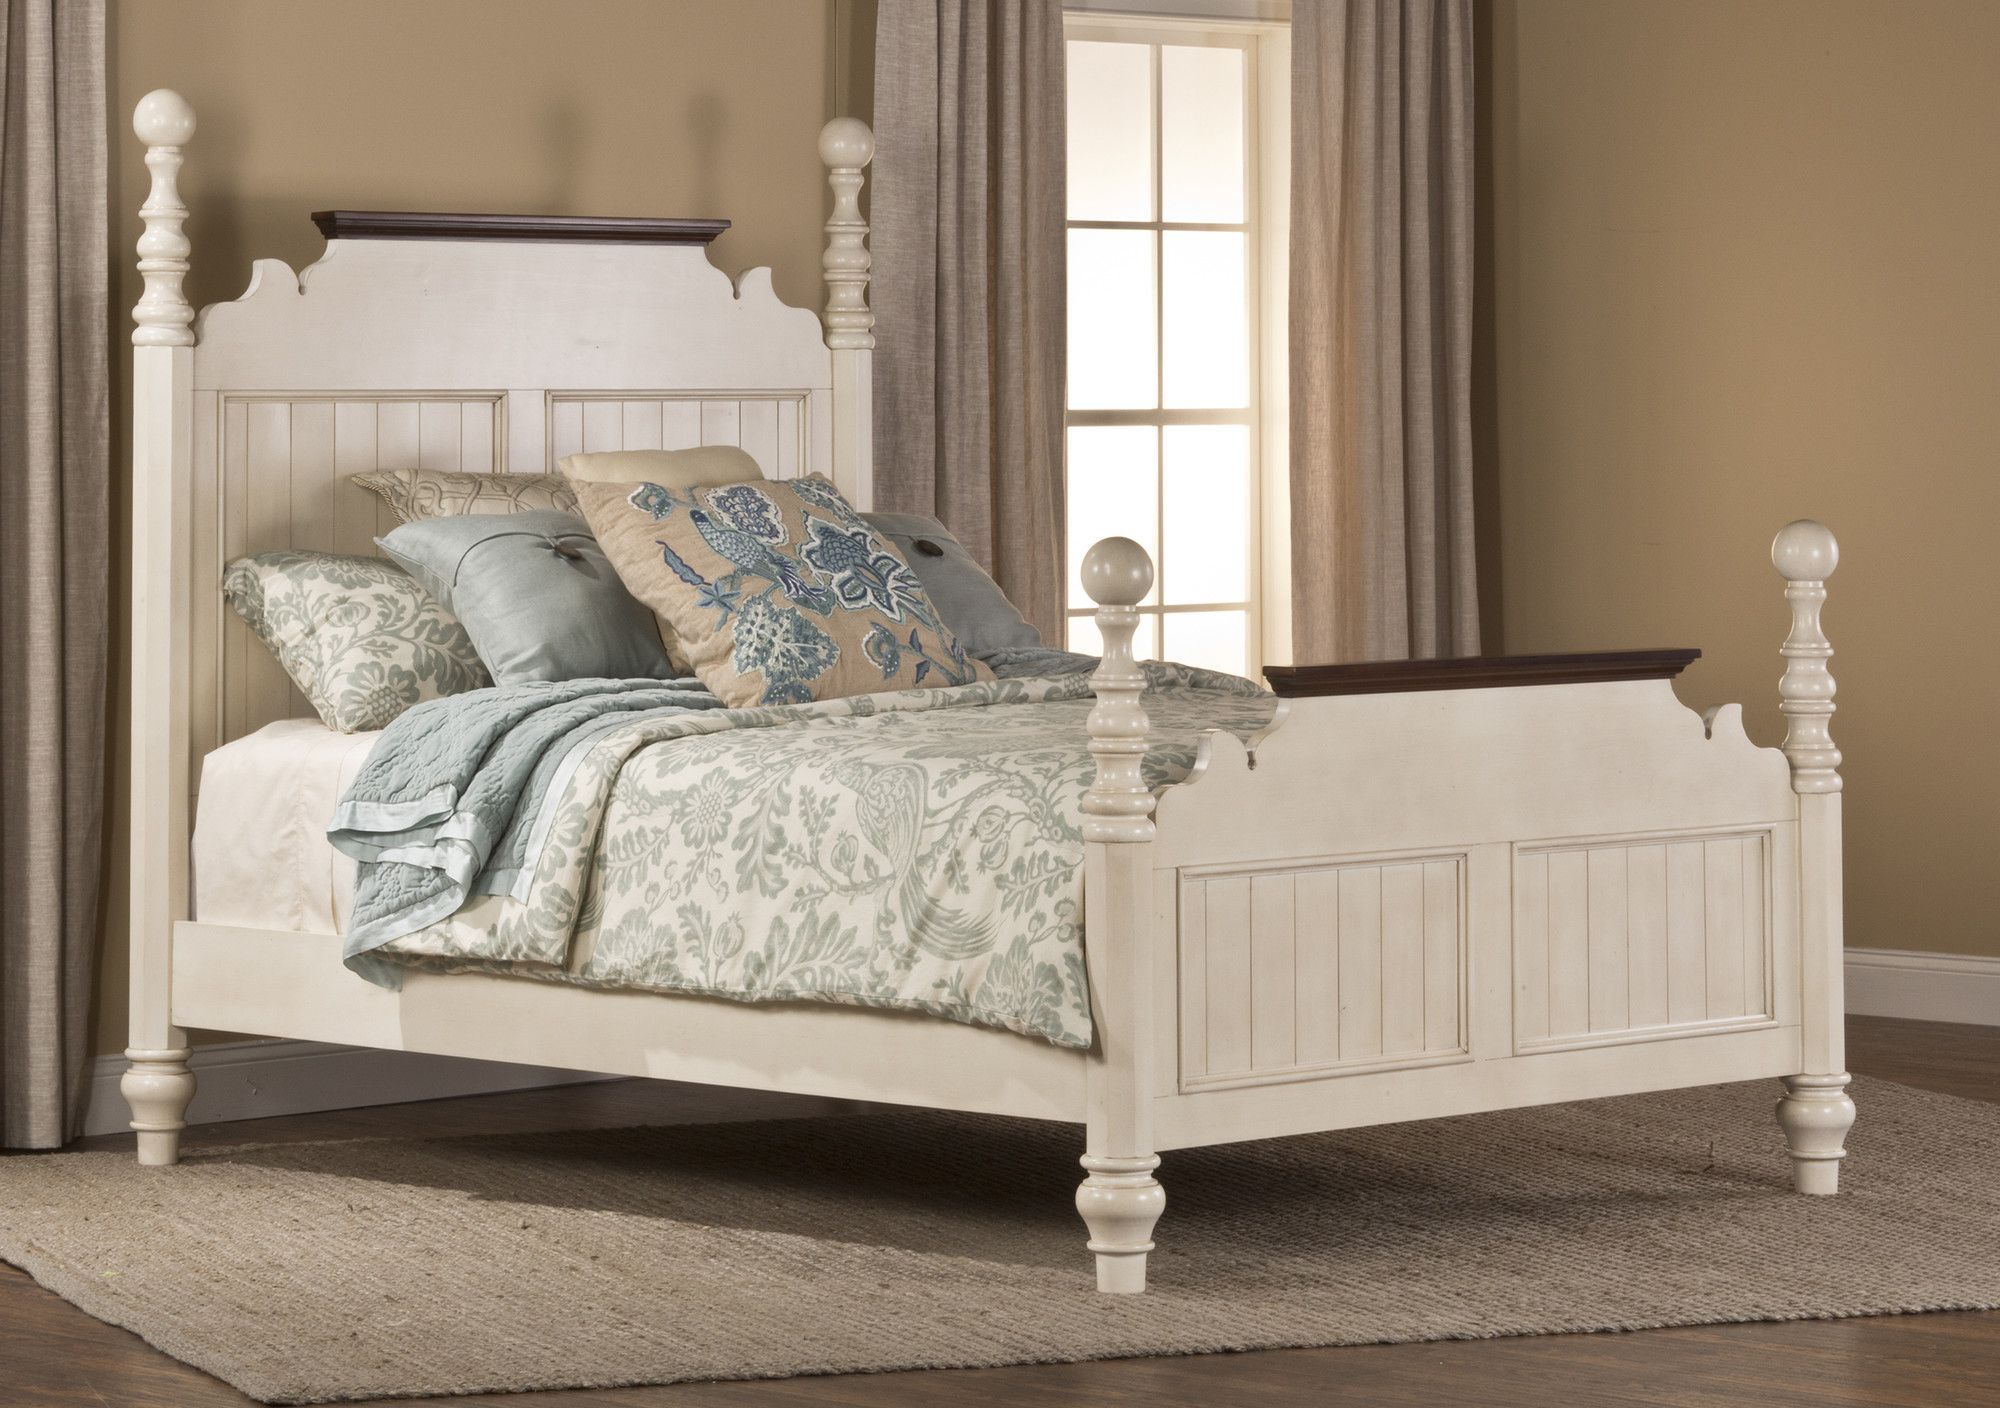 Pine Island Panel Bed Hillsdale furniture, Furniture